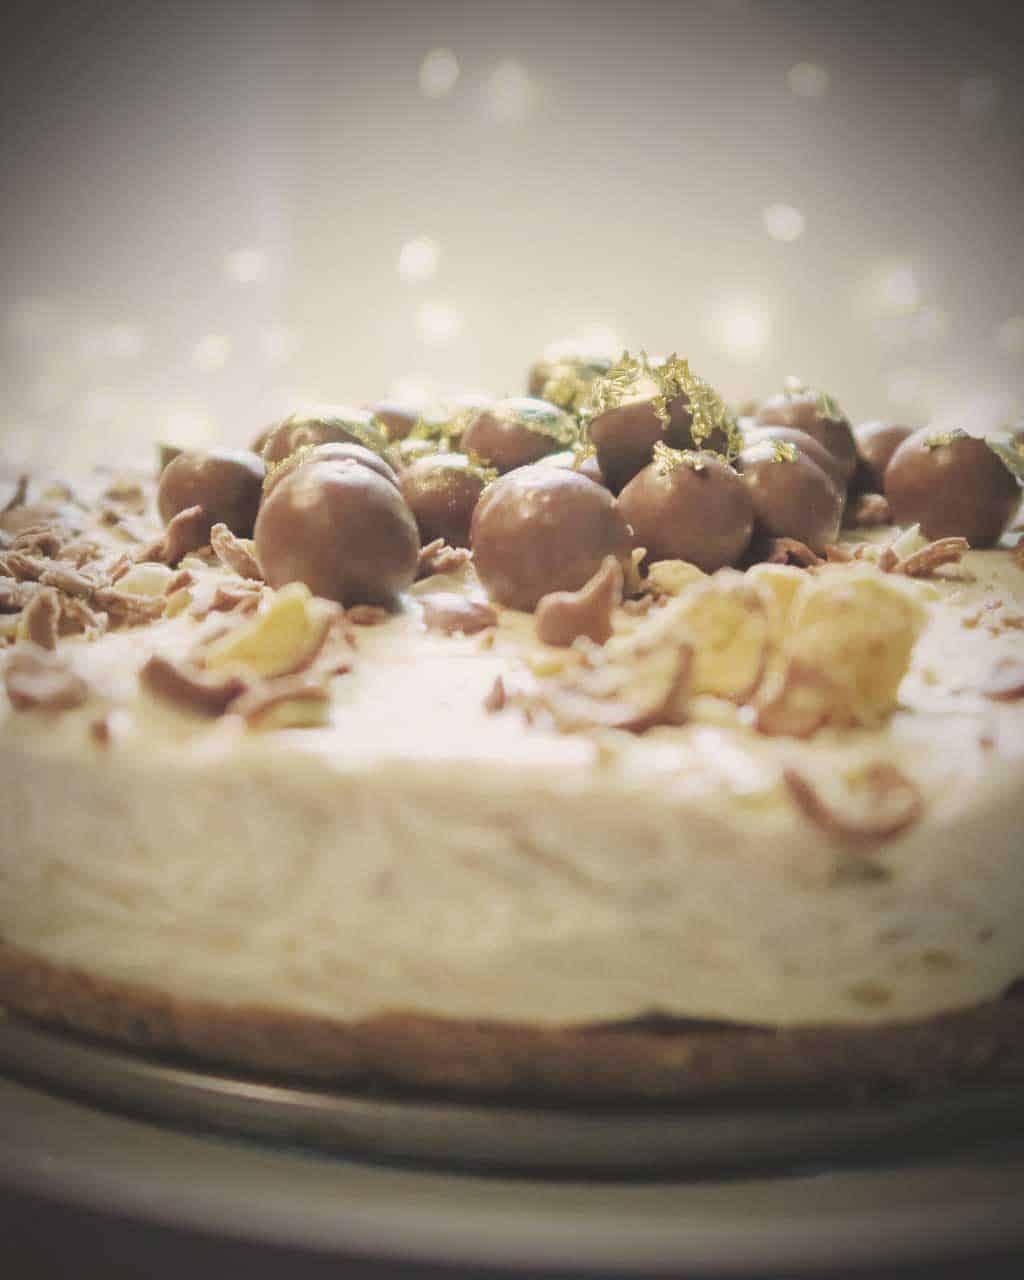 Easy No Bake Malteser Cheesecake